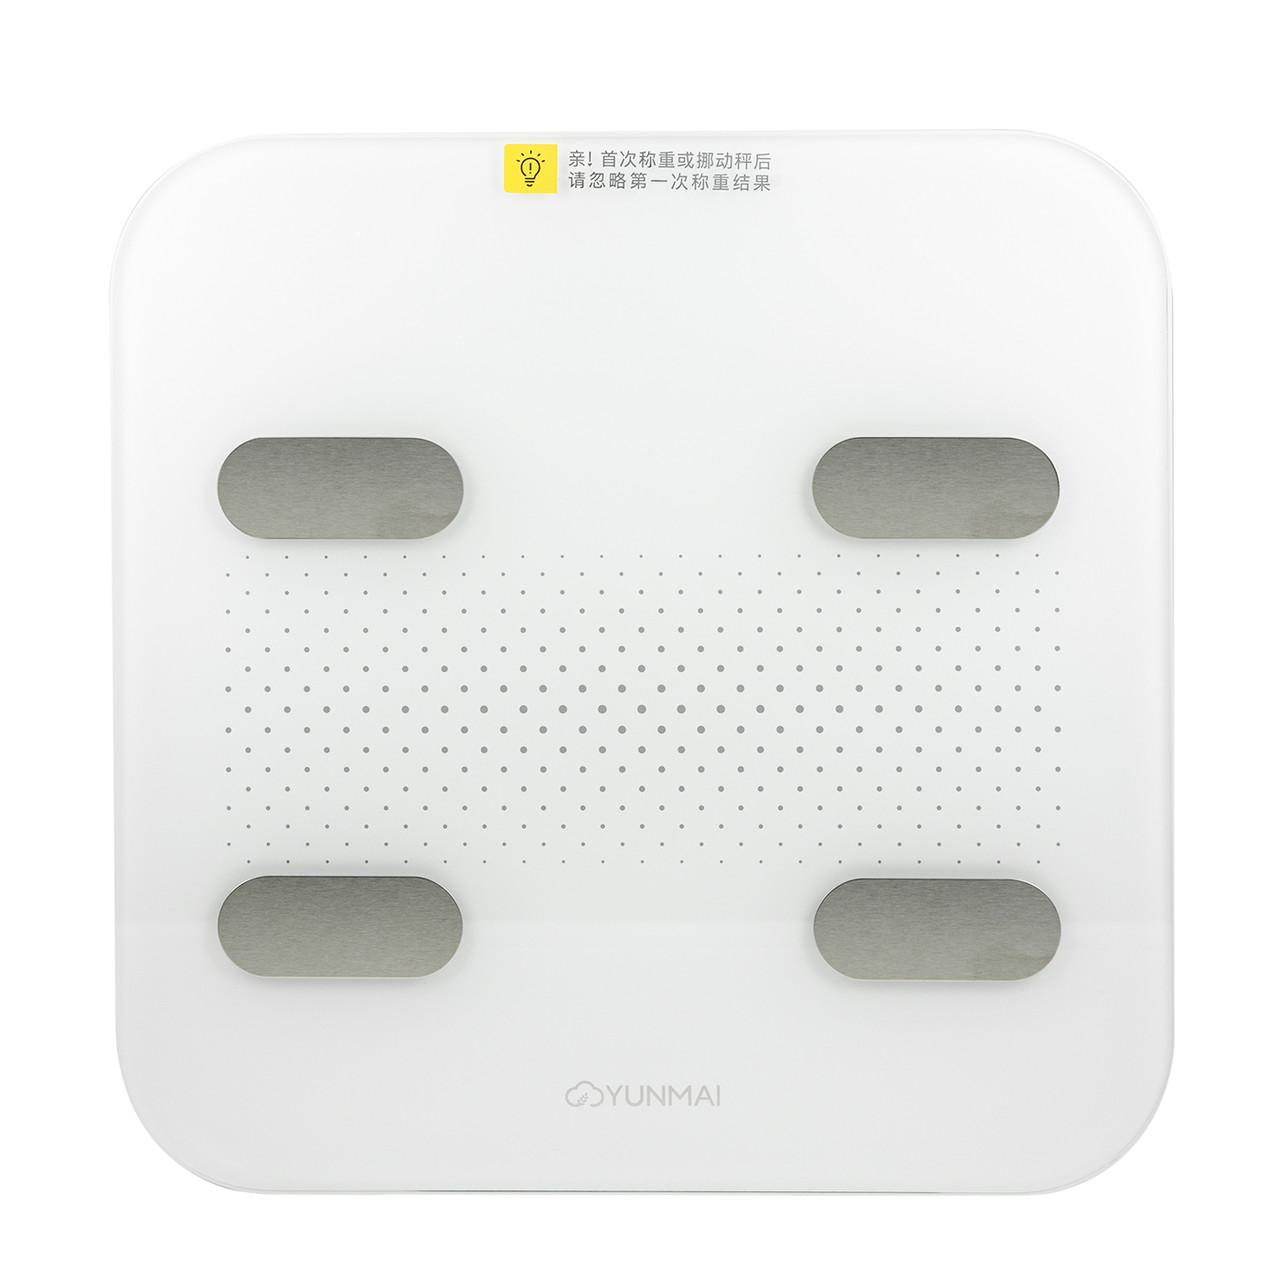 Умные весы Xiaomi Yunmai Smart Body Fat Scale Color 2 ,White